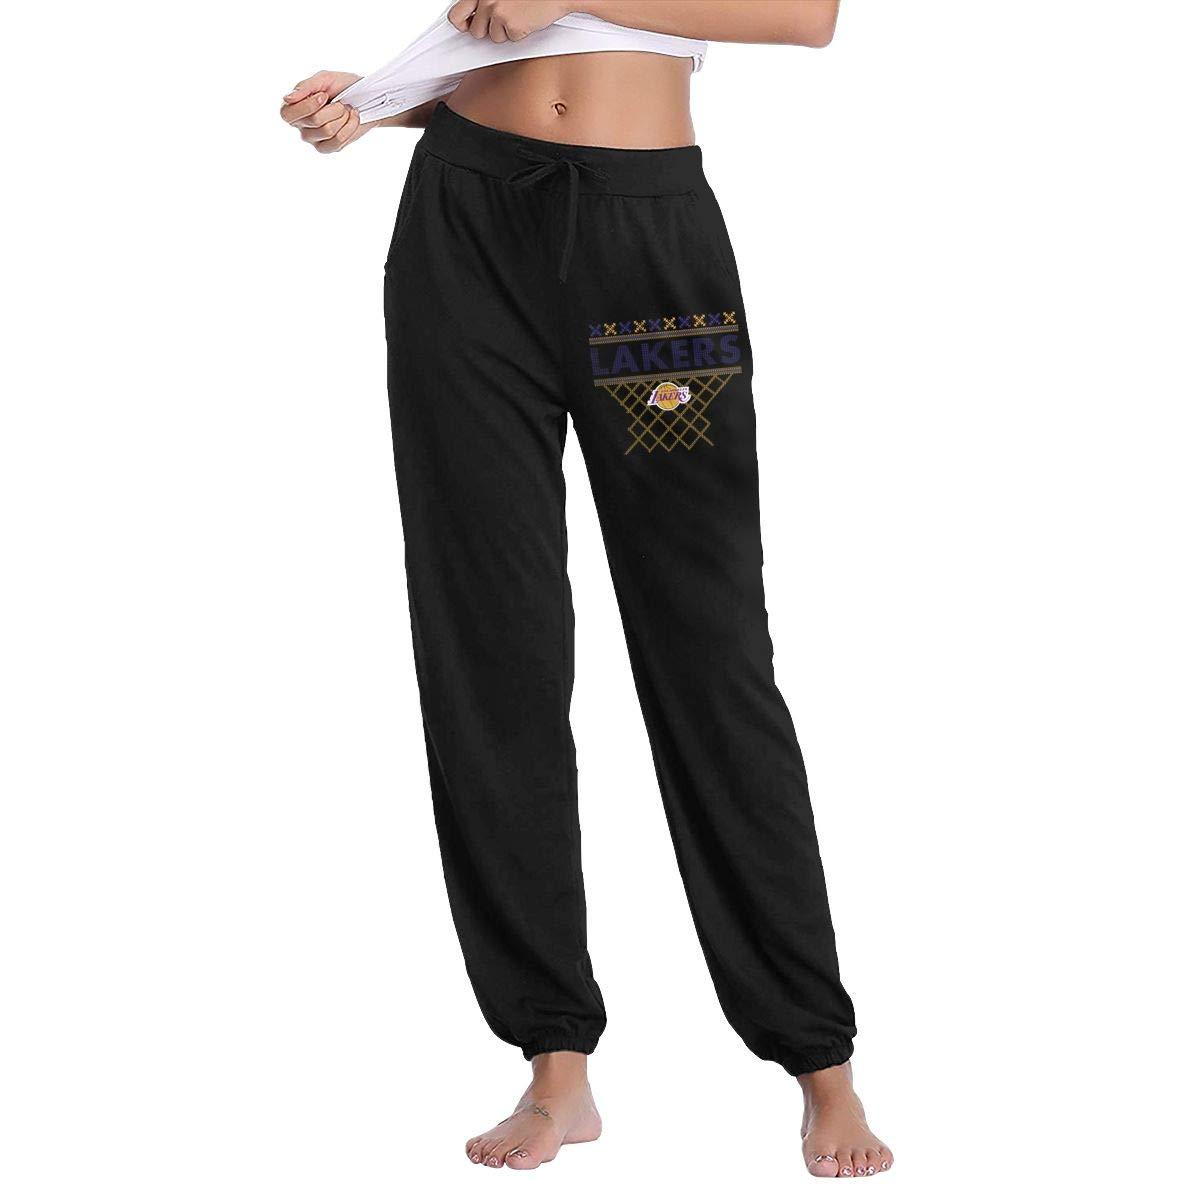 Black M GavDon Women's LosAngelesLakers2016ChristmasDay Casual Sweatpants Yoga Jogger Lounge Sweat Pants with Pockets